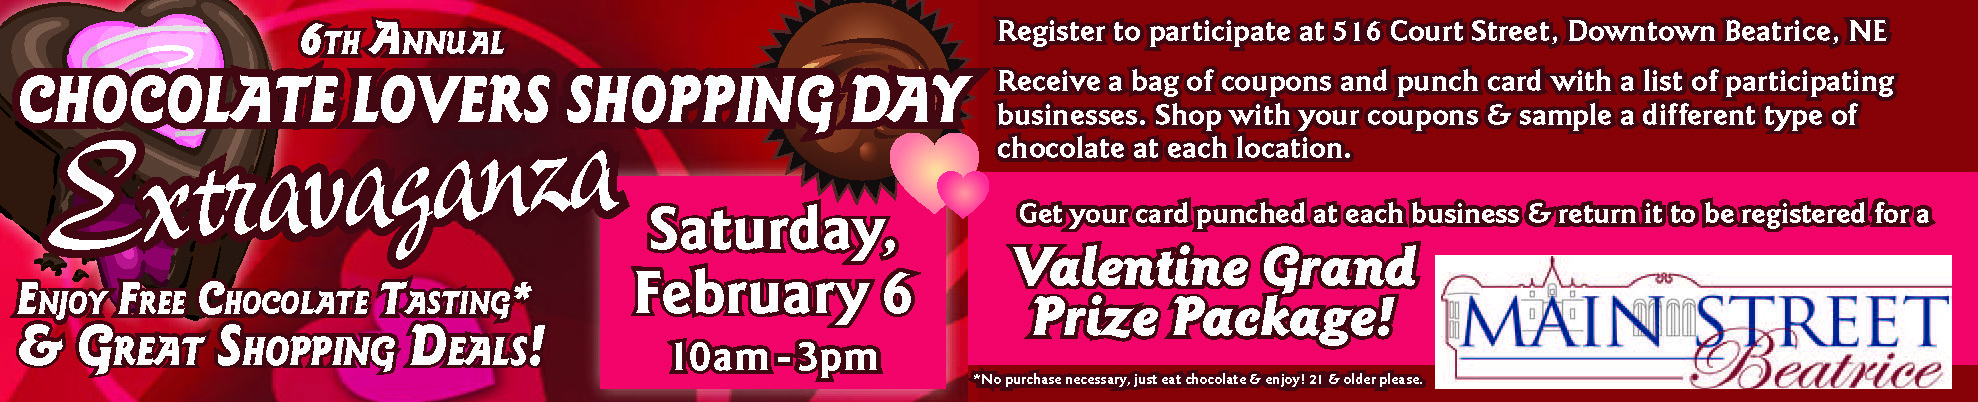 2016 5th Annual Chocolate Lover's Event Beatrice, NE